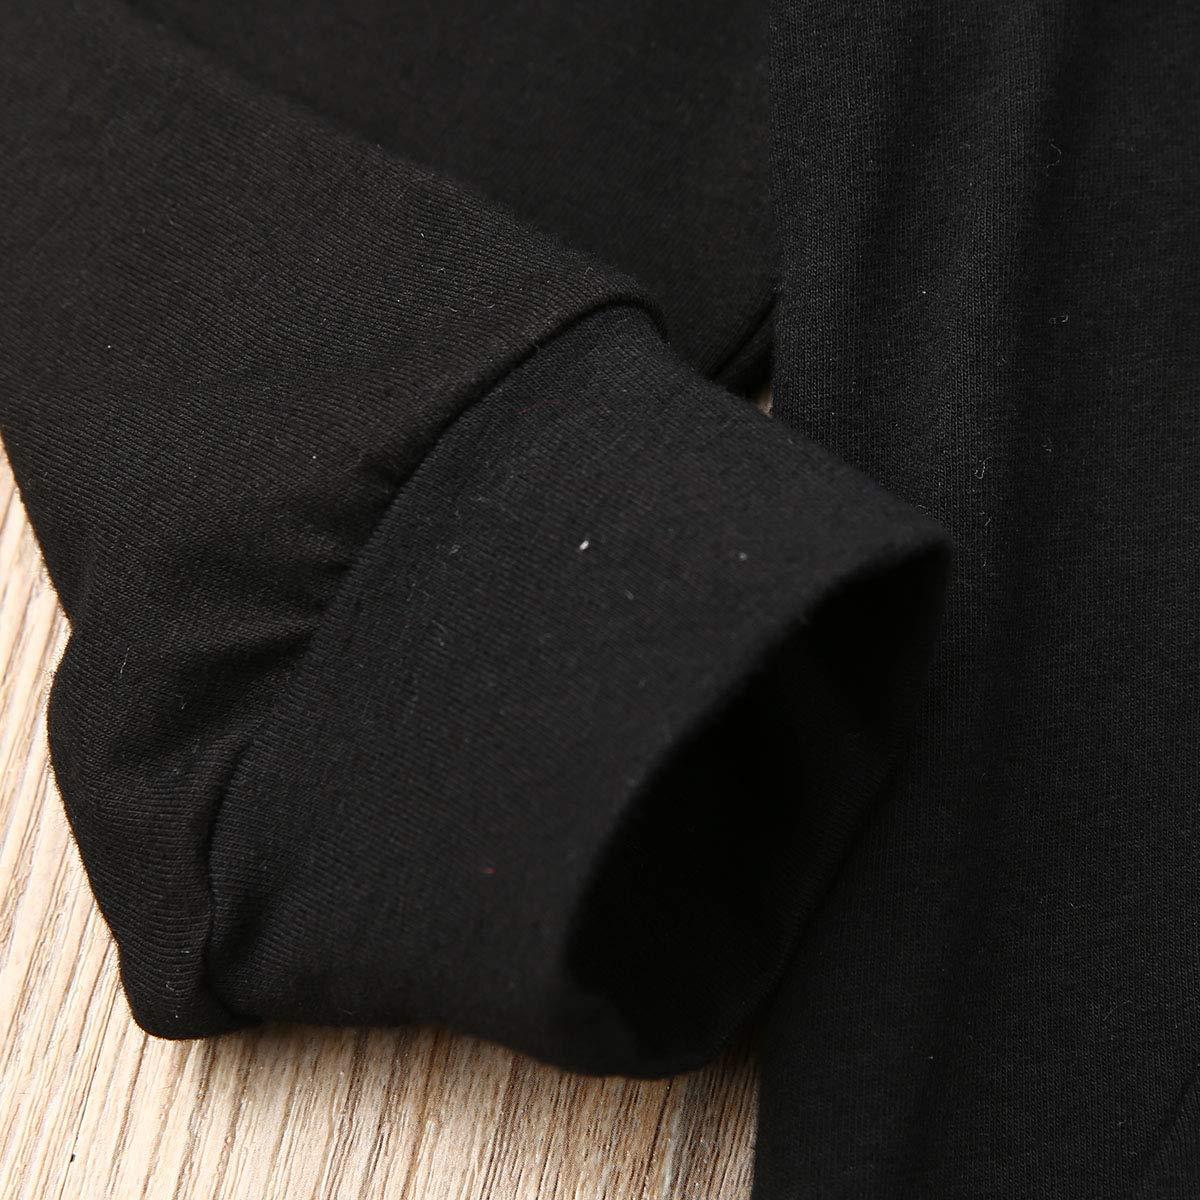 Urkutoba Unisex Baby Autumn Winter Hooded T-Shirt Infant Boys Girls Cotton Hoodies with Muff Pockets